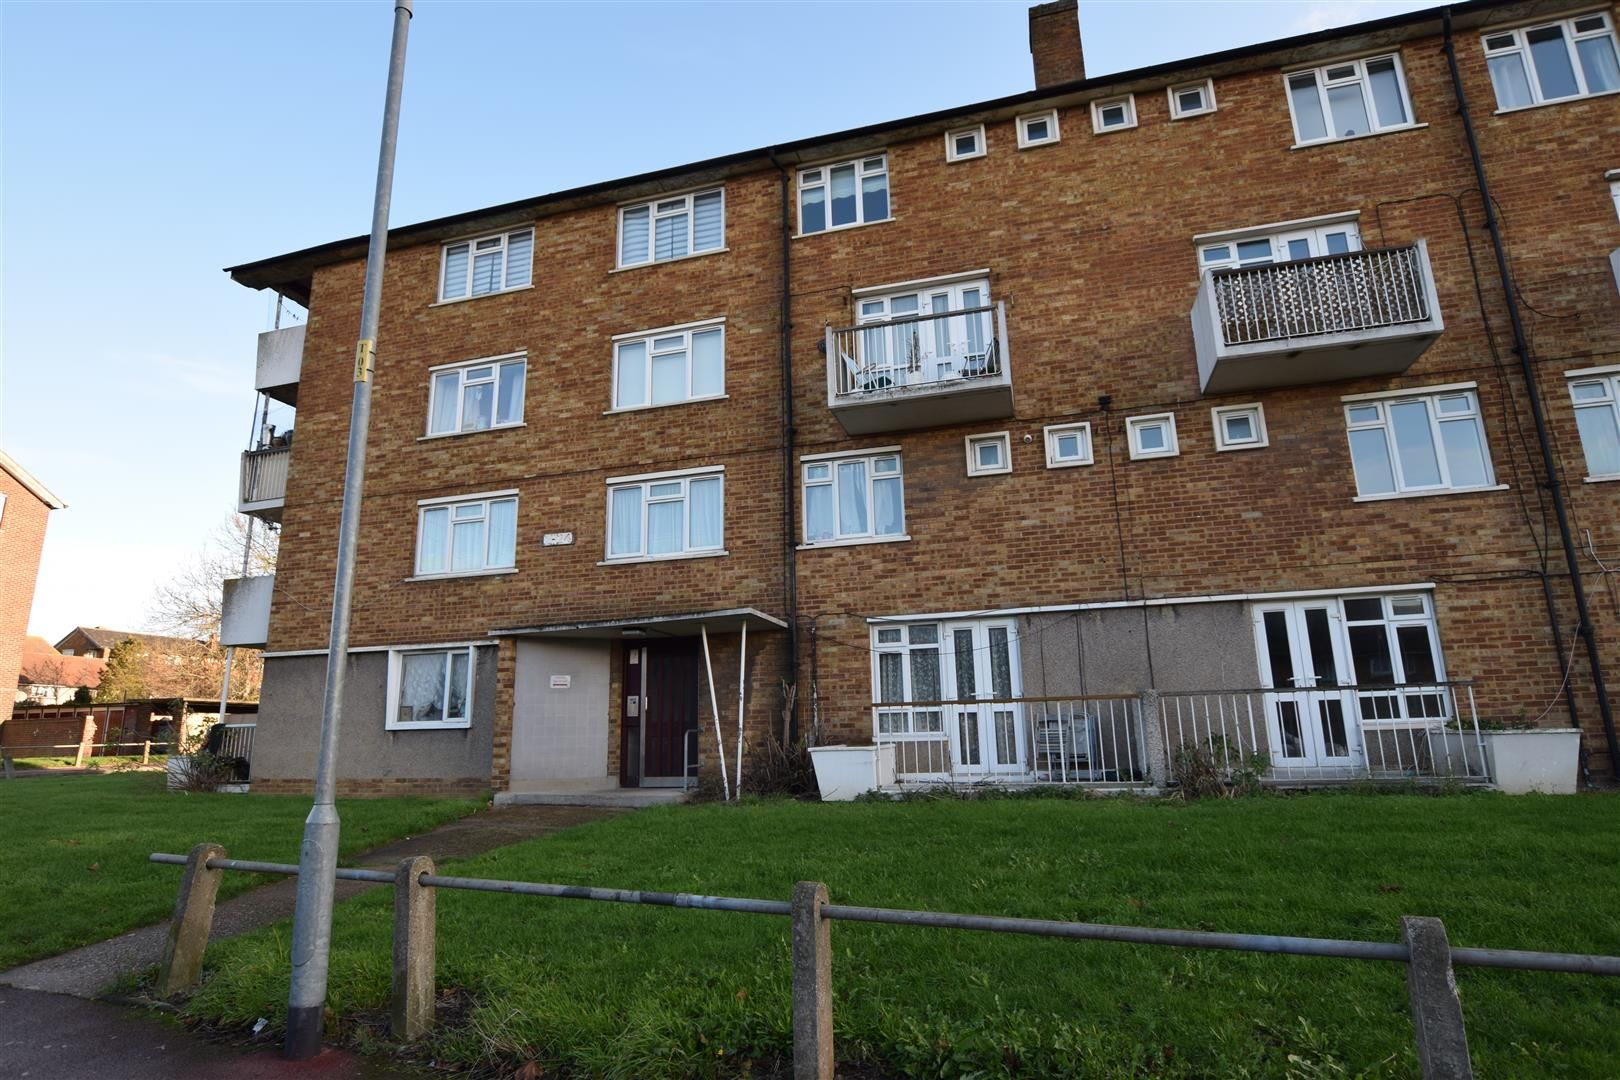 Property photo 1 of 6. 064.Jpg